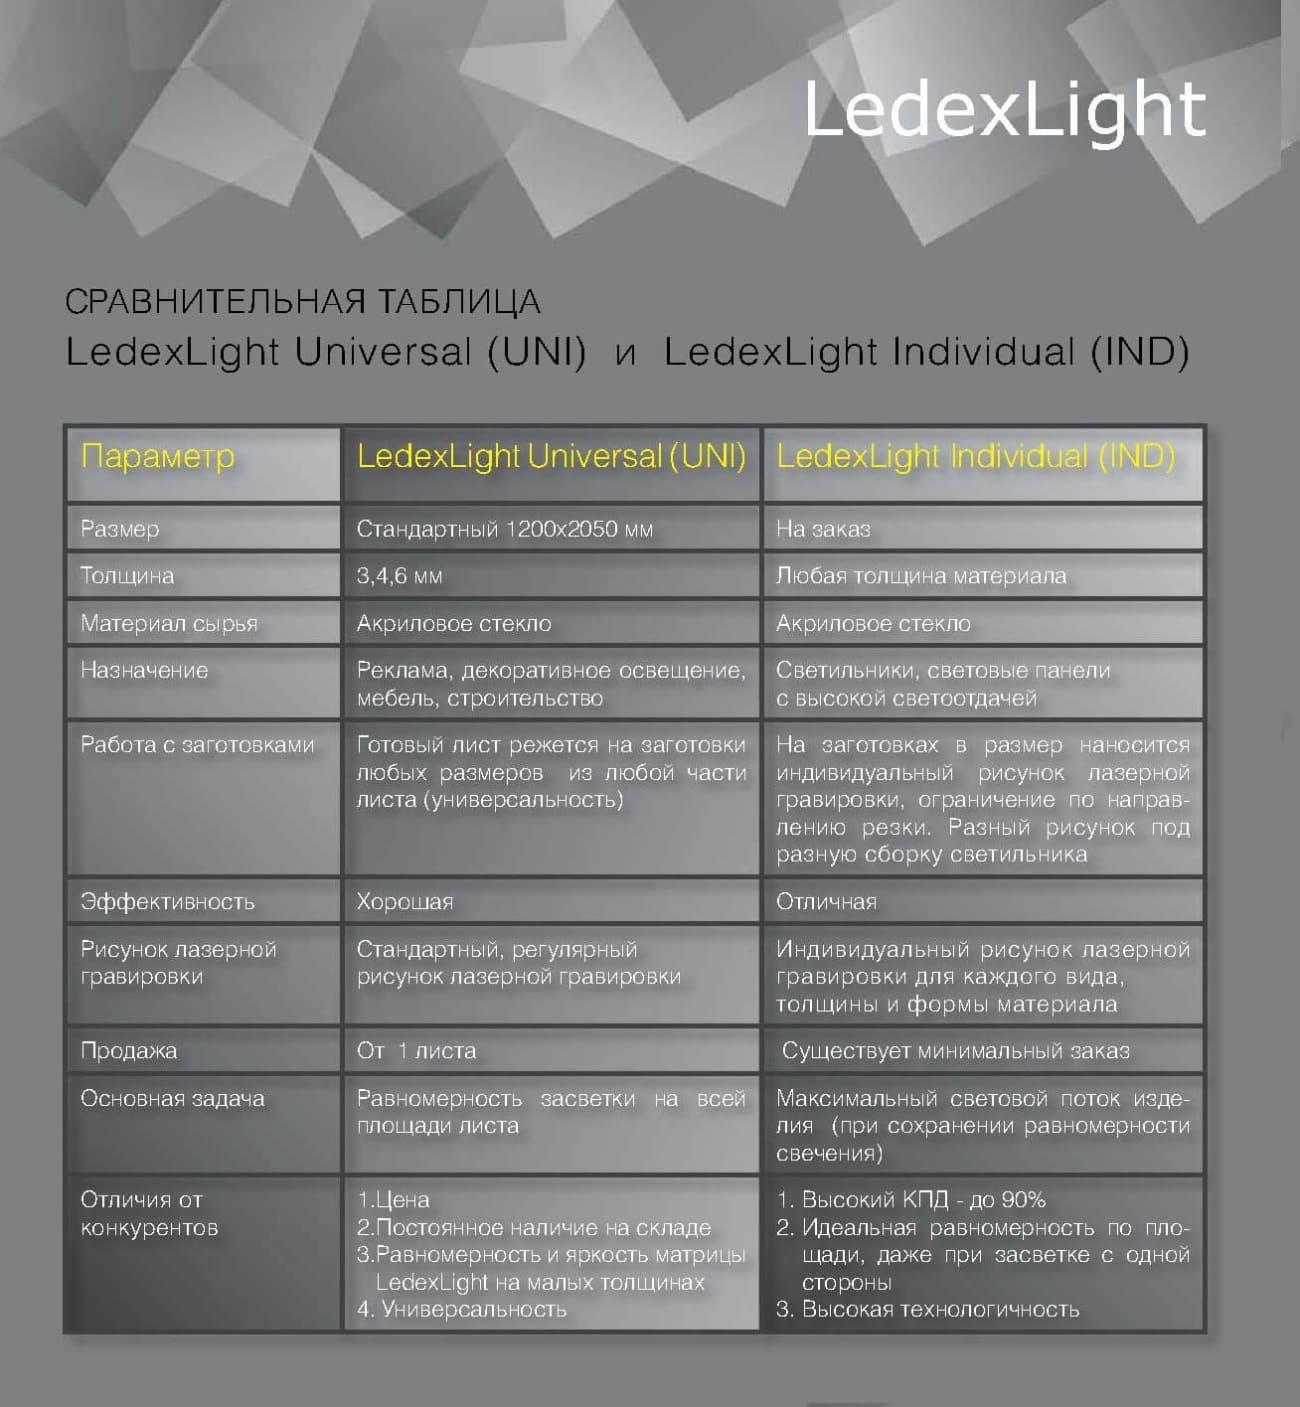 Ledexlight таблица